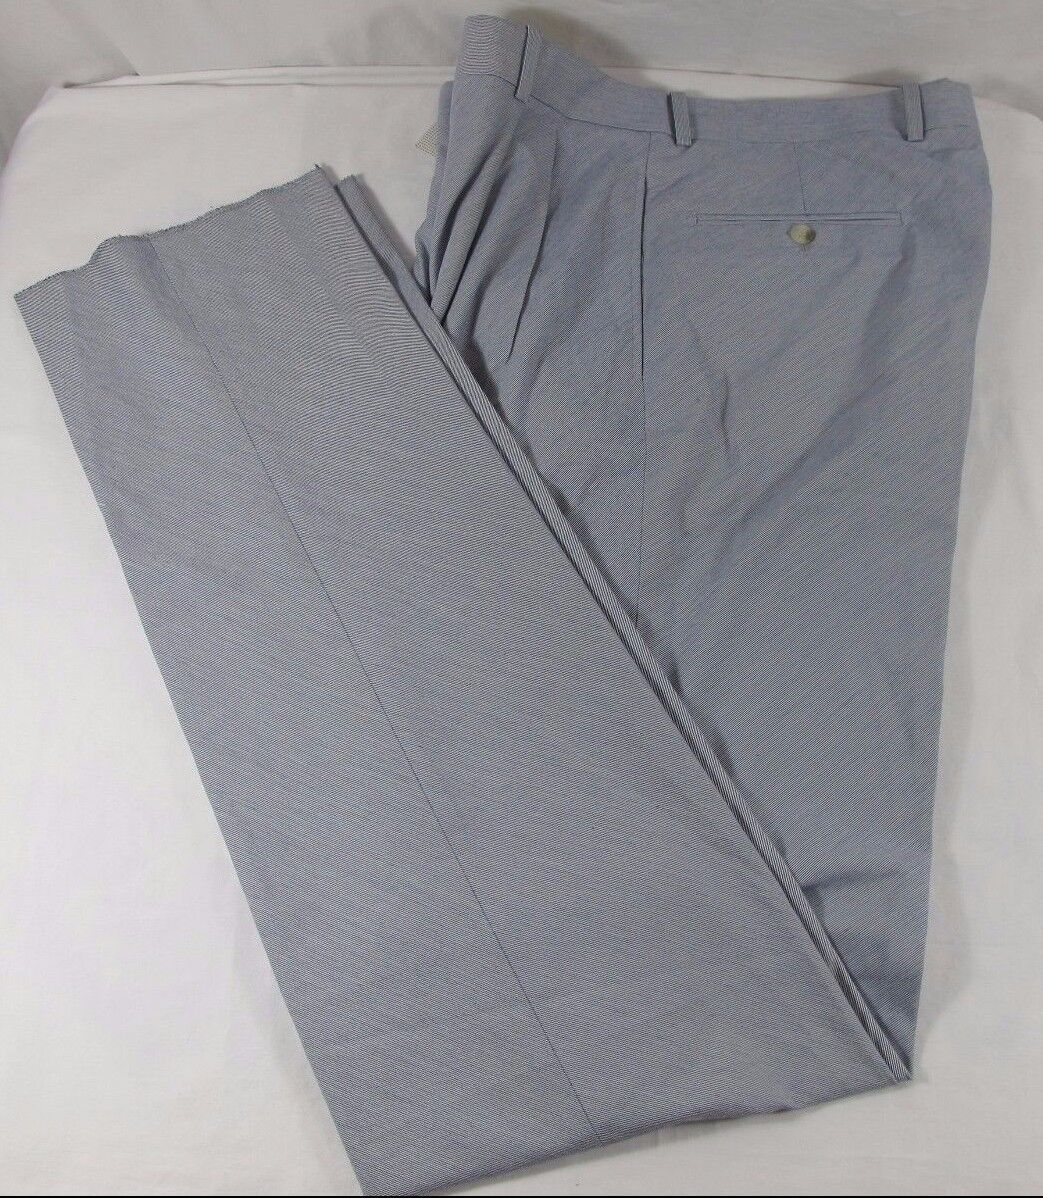 Bernard Zins bluee Polyester Cotton Pleated Fine Striped Pants UNHEMMED Sz 34 NWT